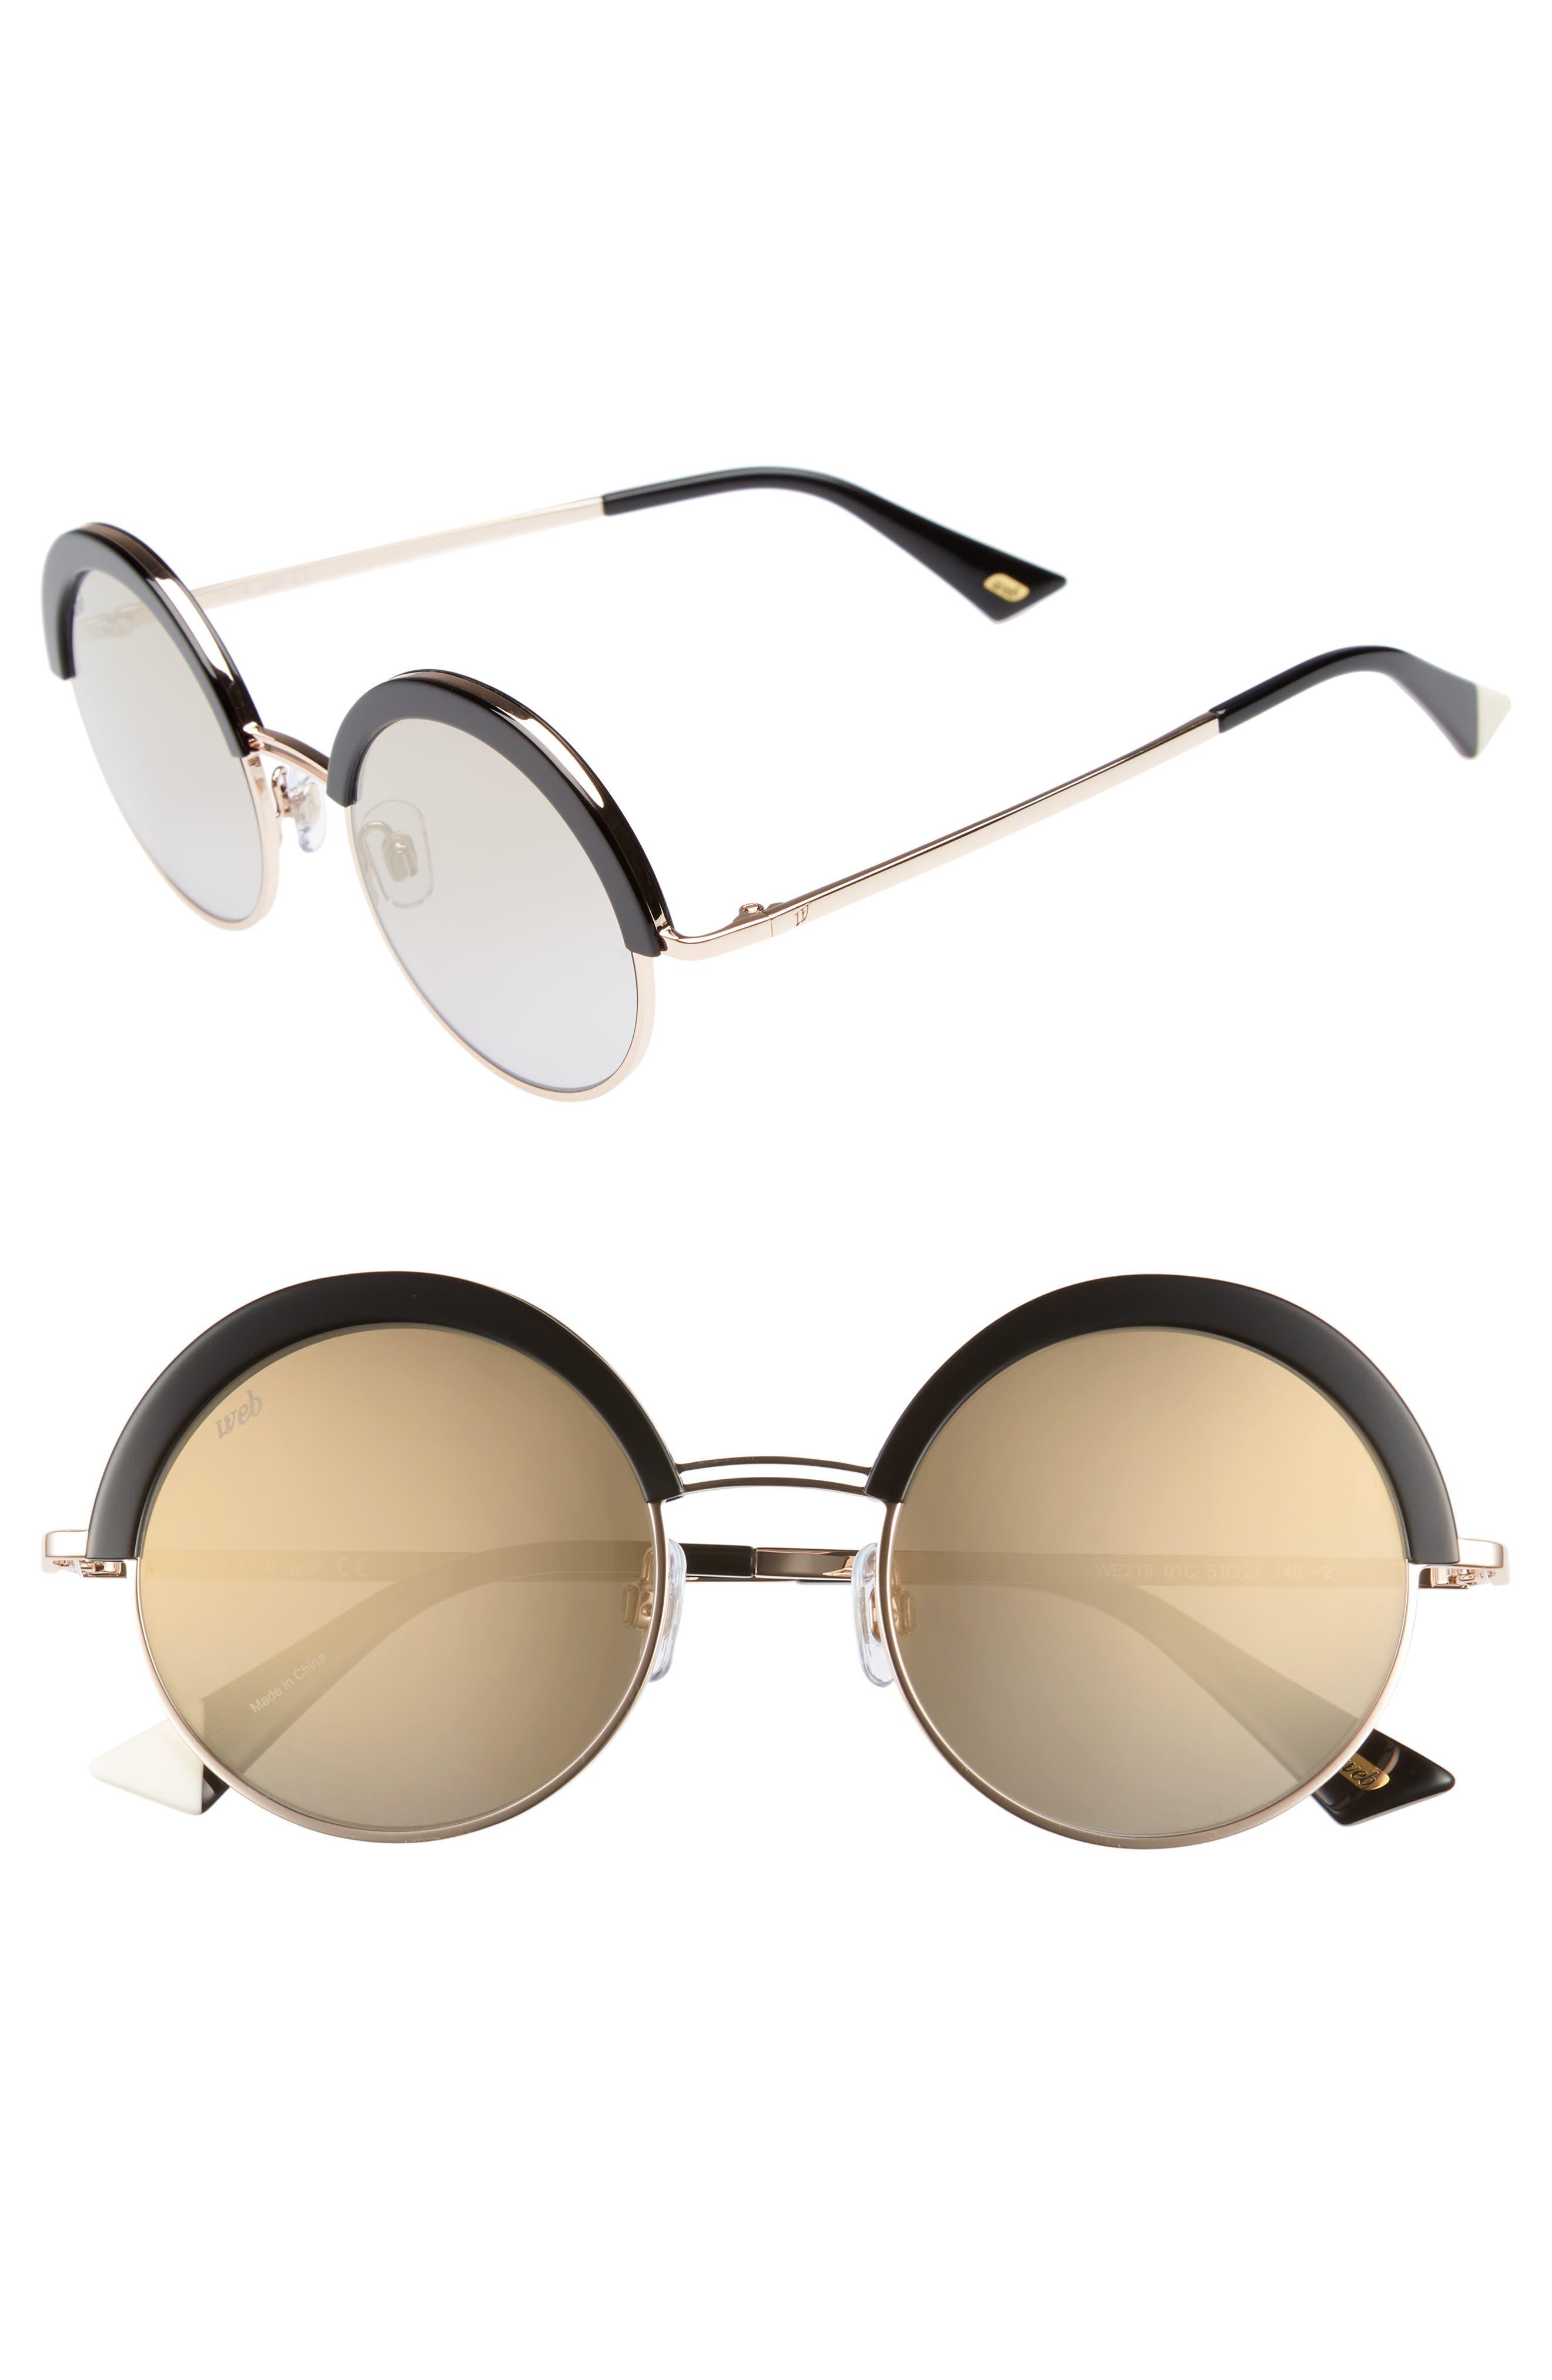 51mm Round Sunglasses,                         Main,                         color, SHINY BLACK/ SMOKE MIRROR